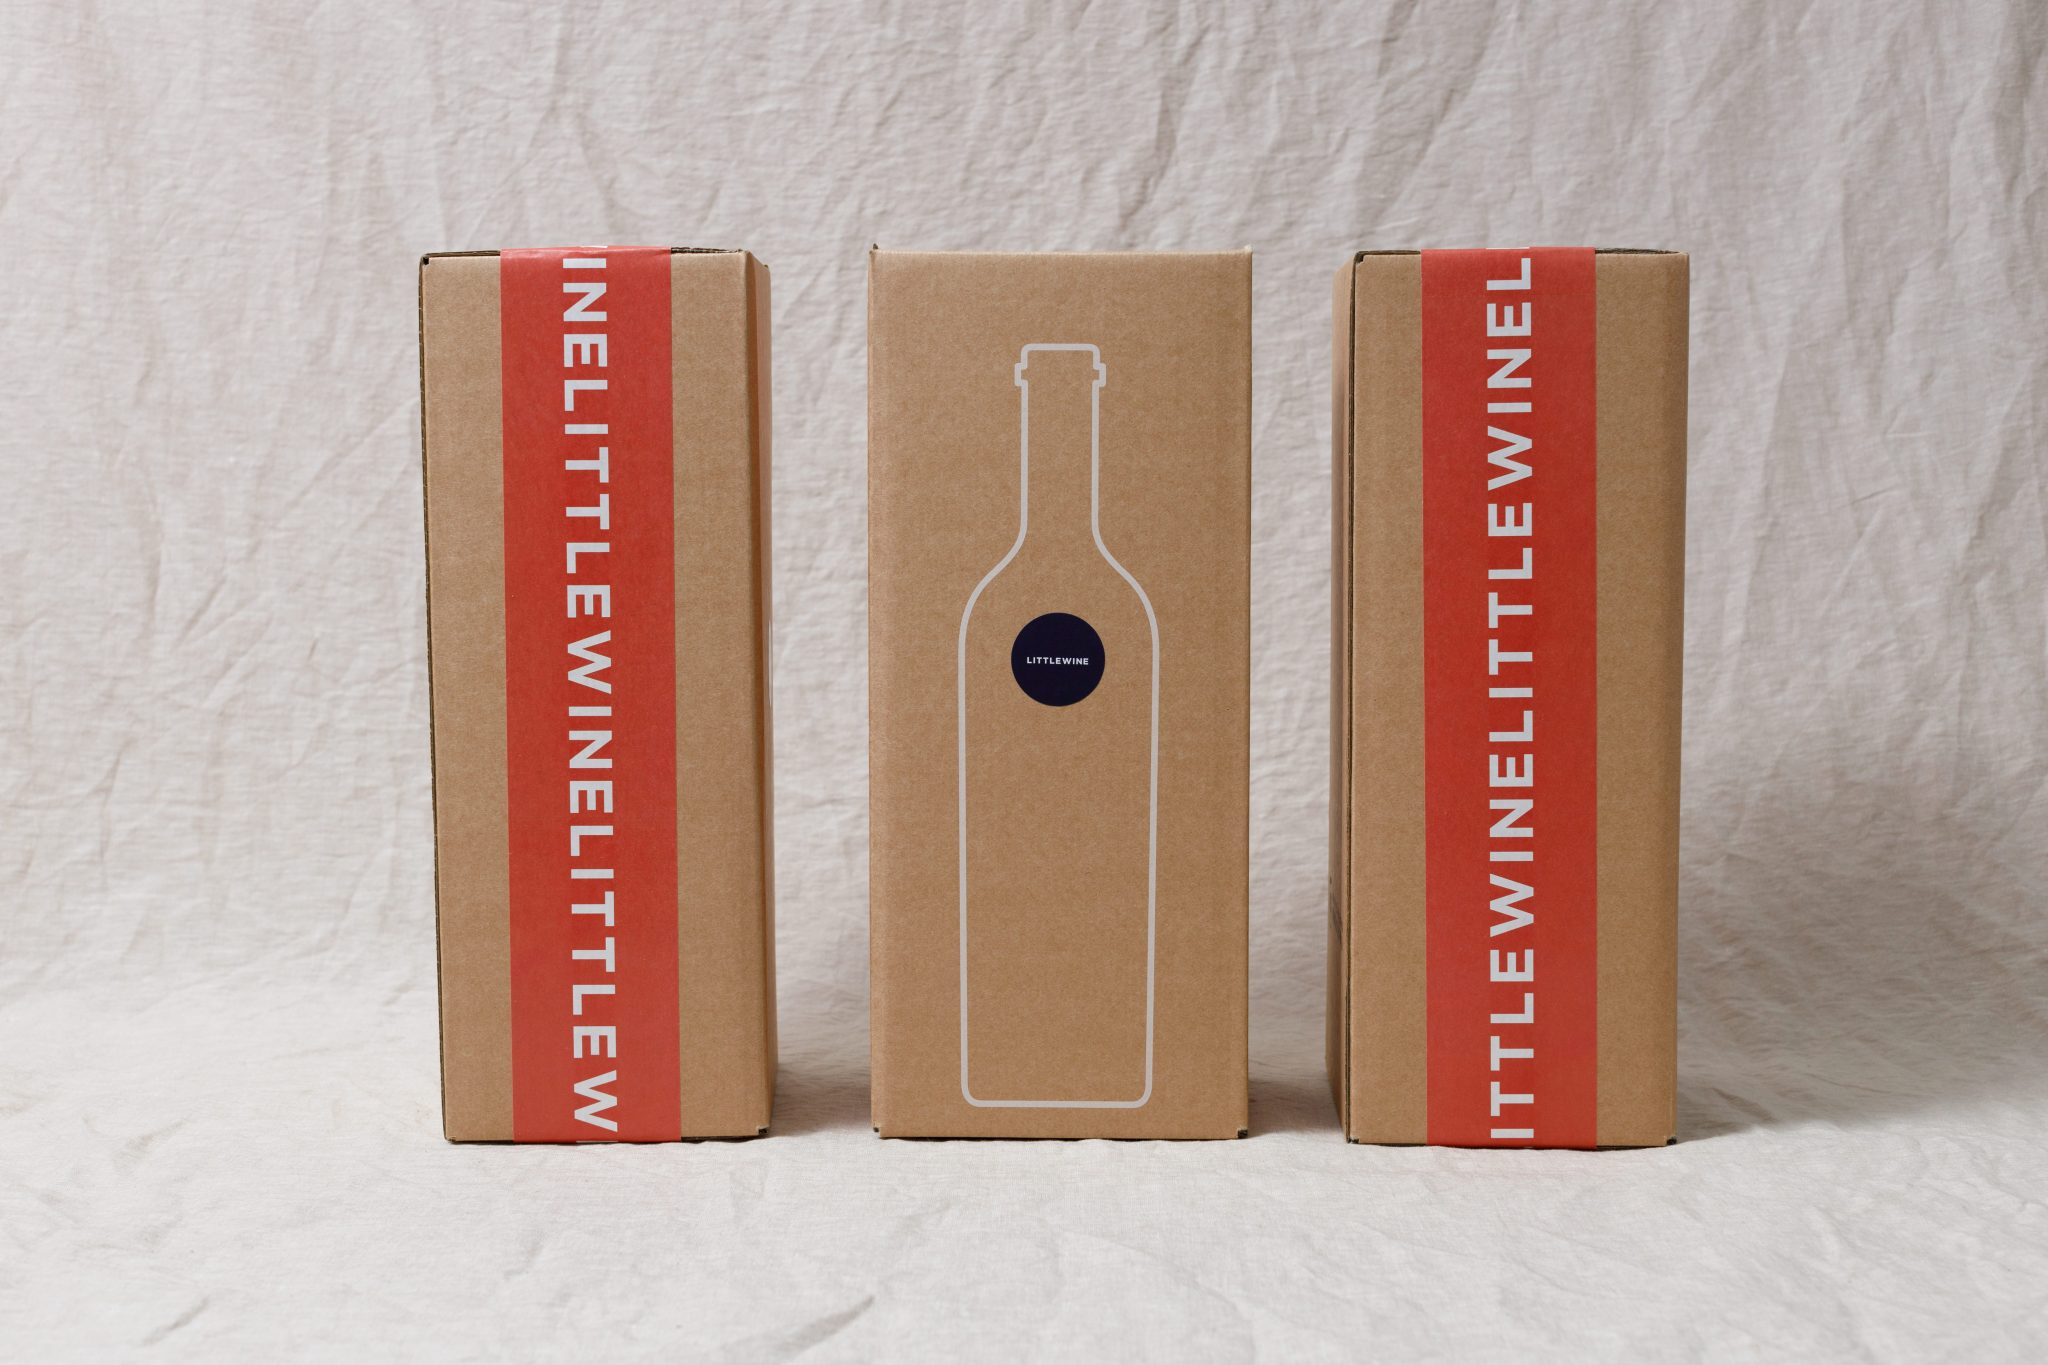 LITTLEWINE wine subscription